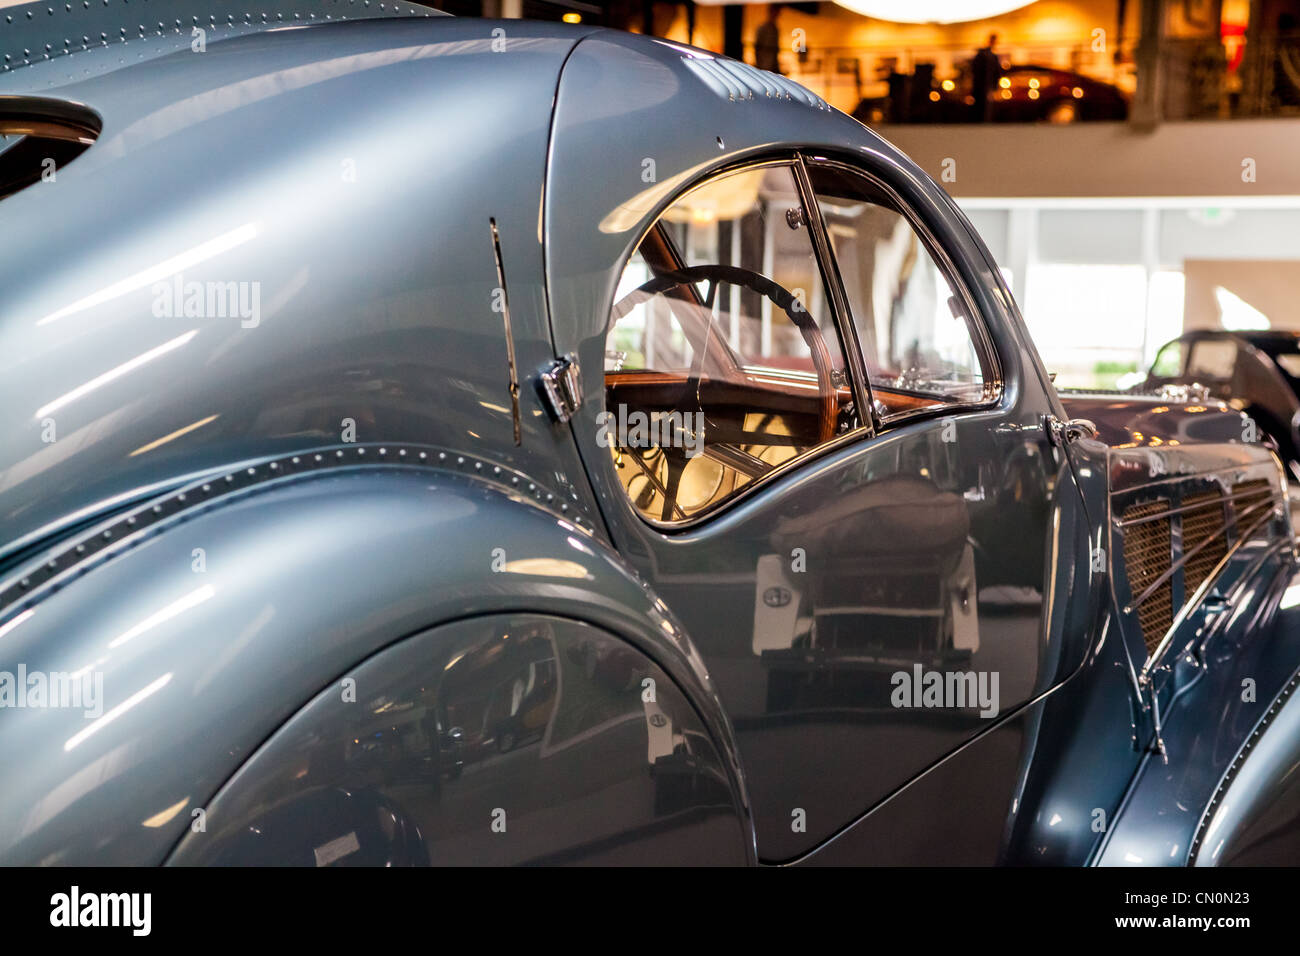 The 1936 Bugatti Type 57 Sc Atlantic At The Mullin Museum In Oxnard Stock Photo Alamy